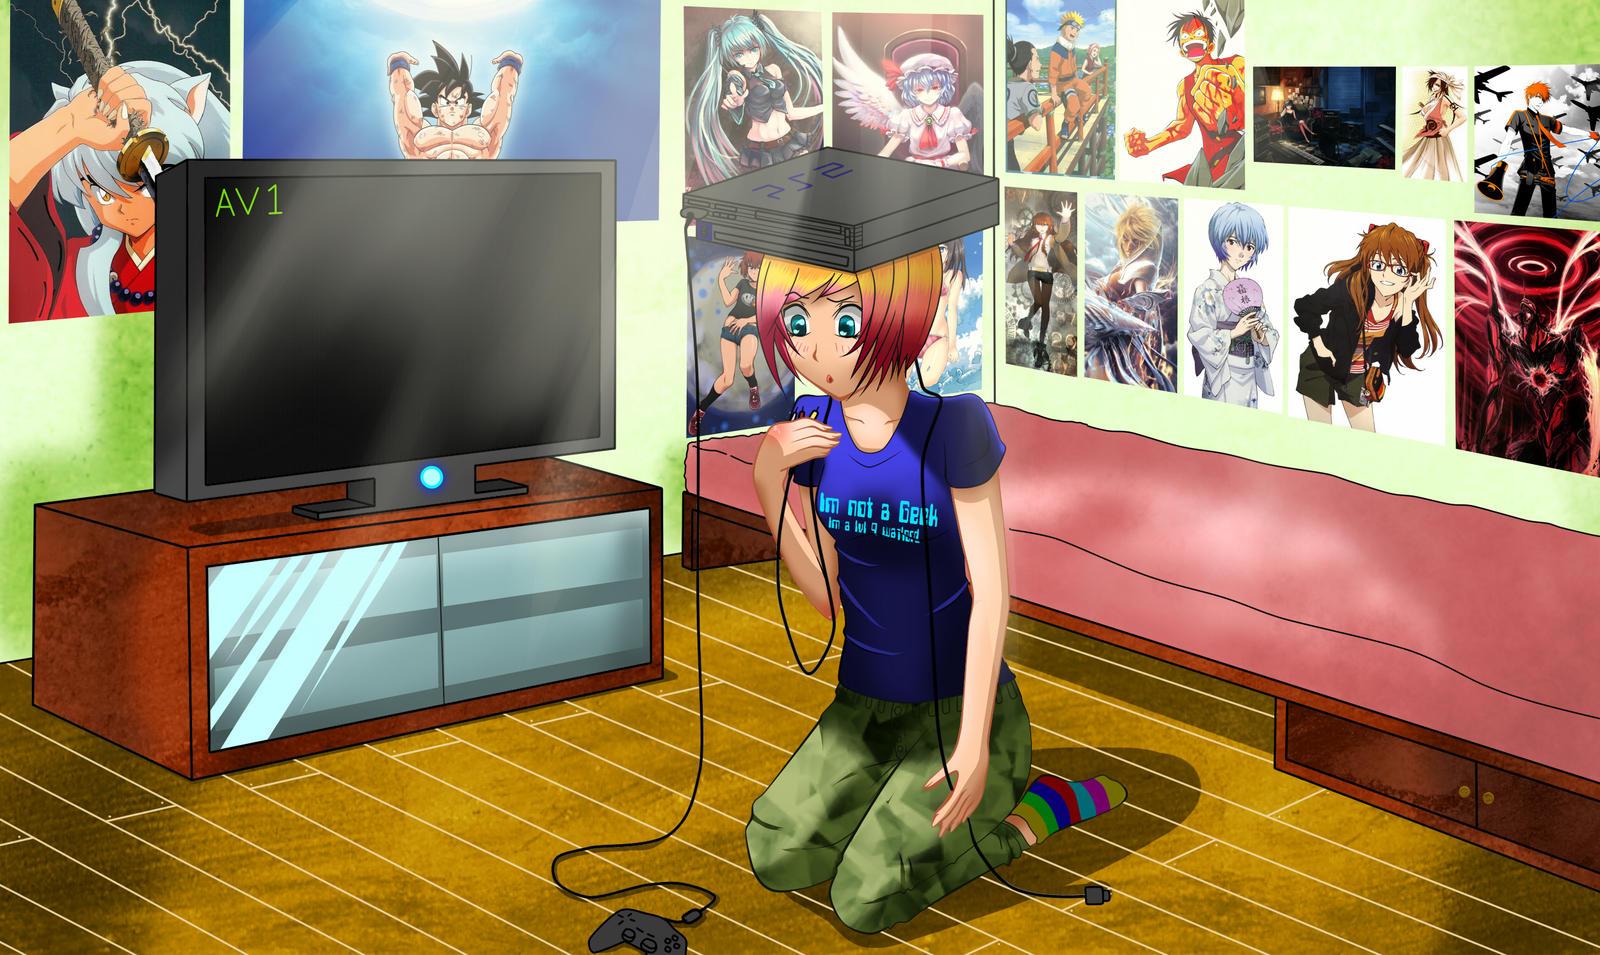 Comm Gamer Room by HeiBK201. Comm Gamer Room by HeiBK201 on DeviantArt